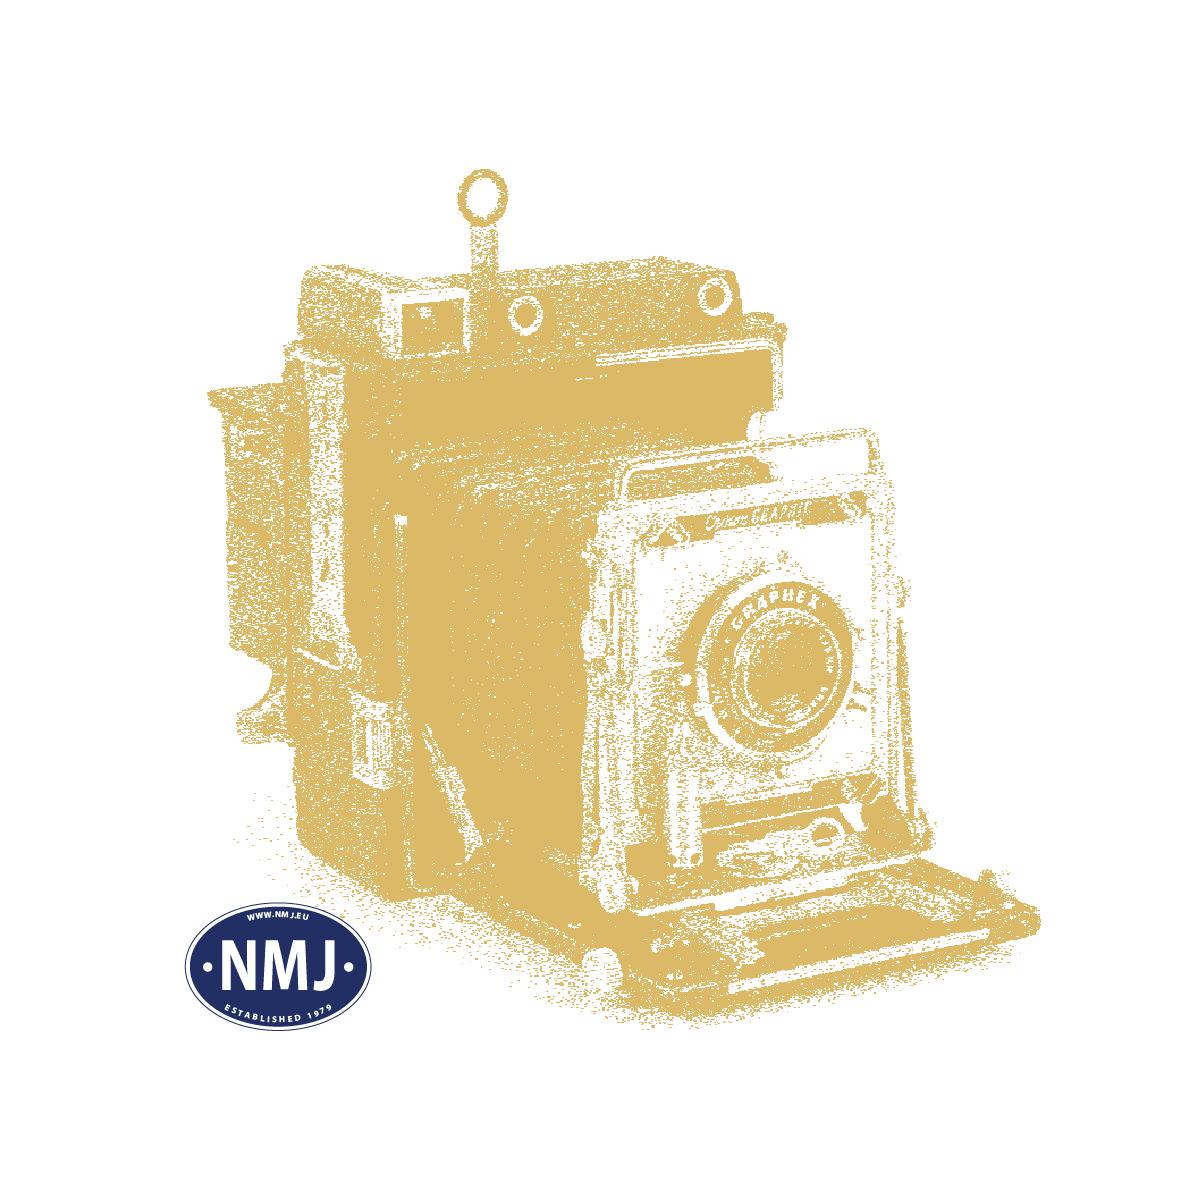 NMJT601.106 - NMJ Topline Modell des Rungenwagens Os 21 74 370 2 399-7 der SJ